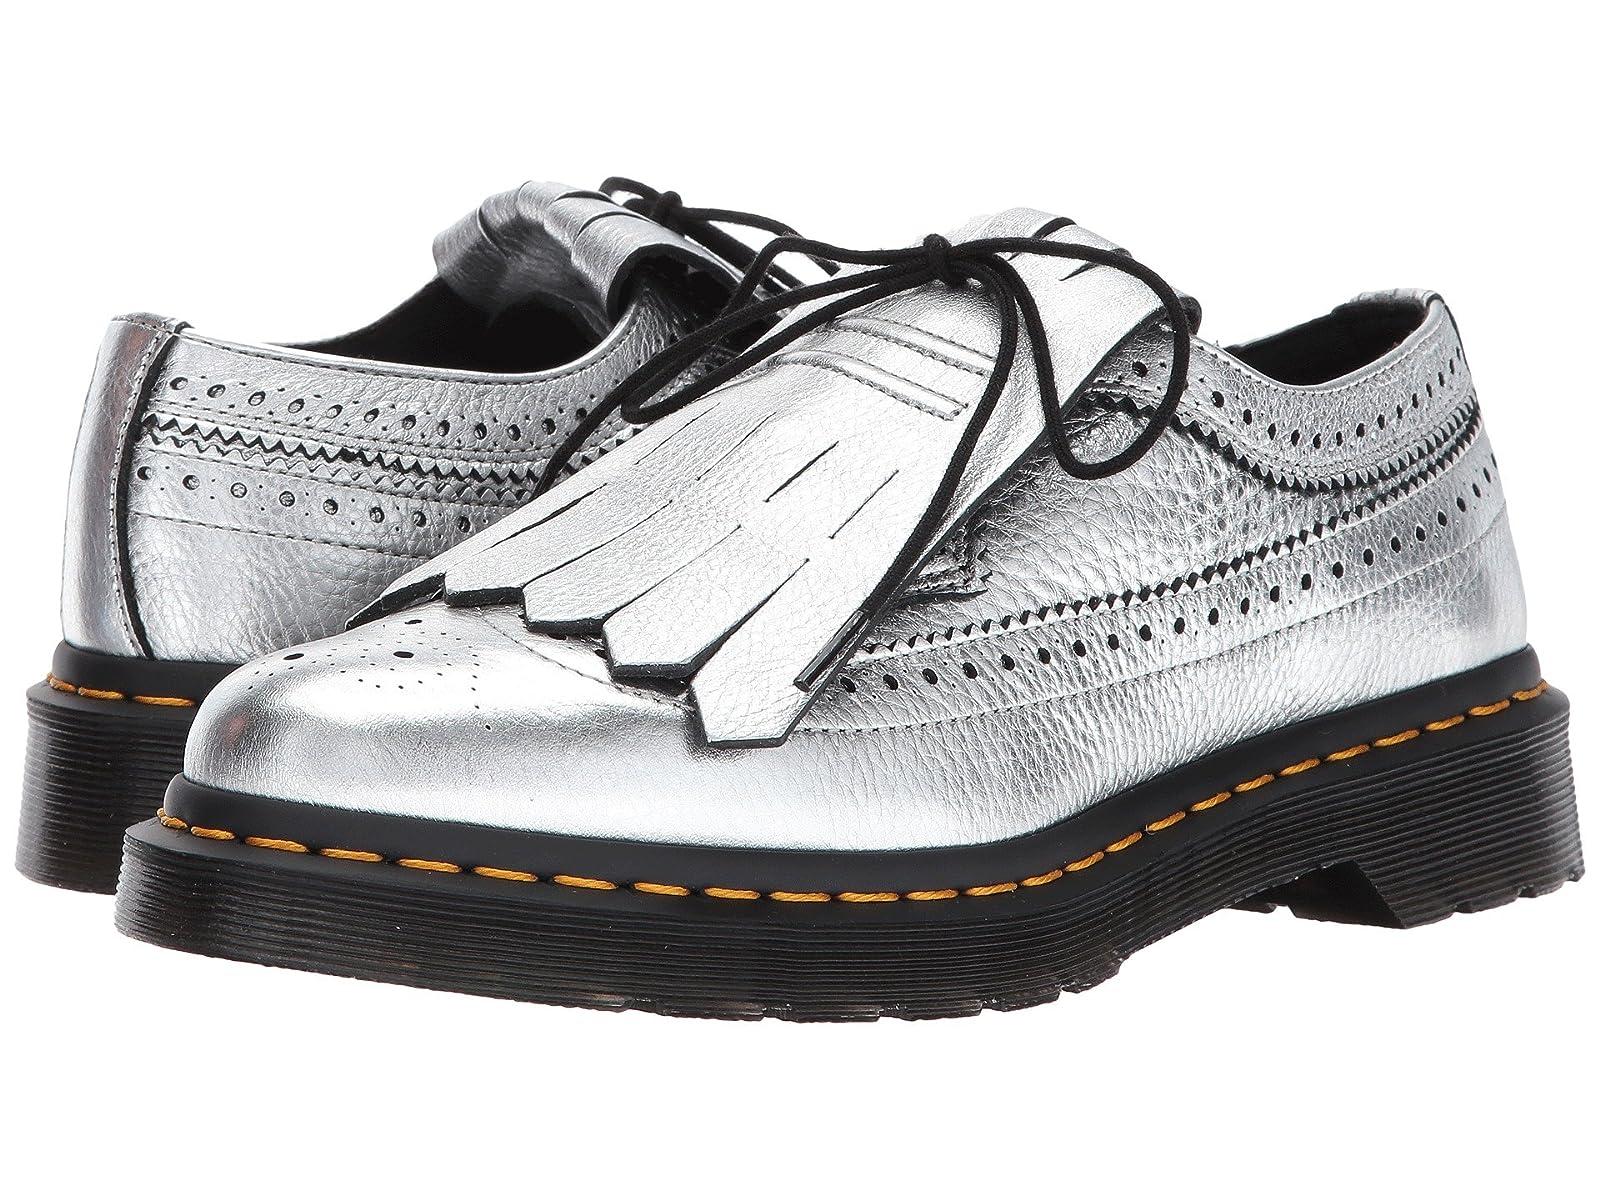 Dr. Martens 3989 Kiltie Metallic Wingtip ShoeCheap and distinctive eye-catching shoes